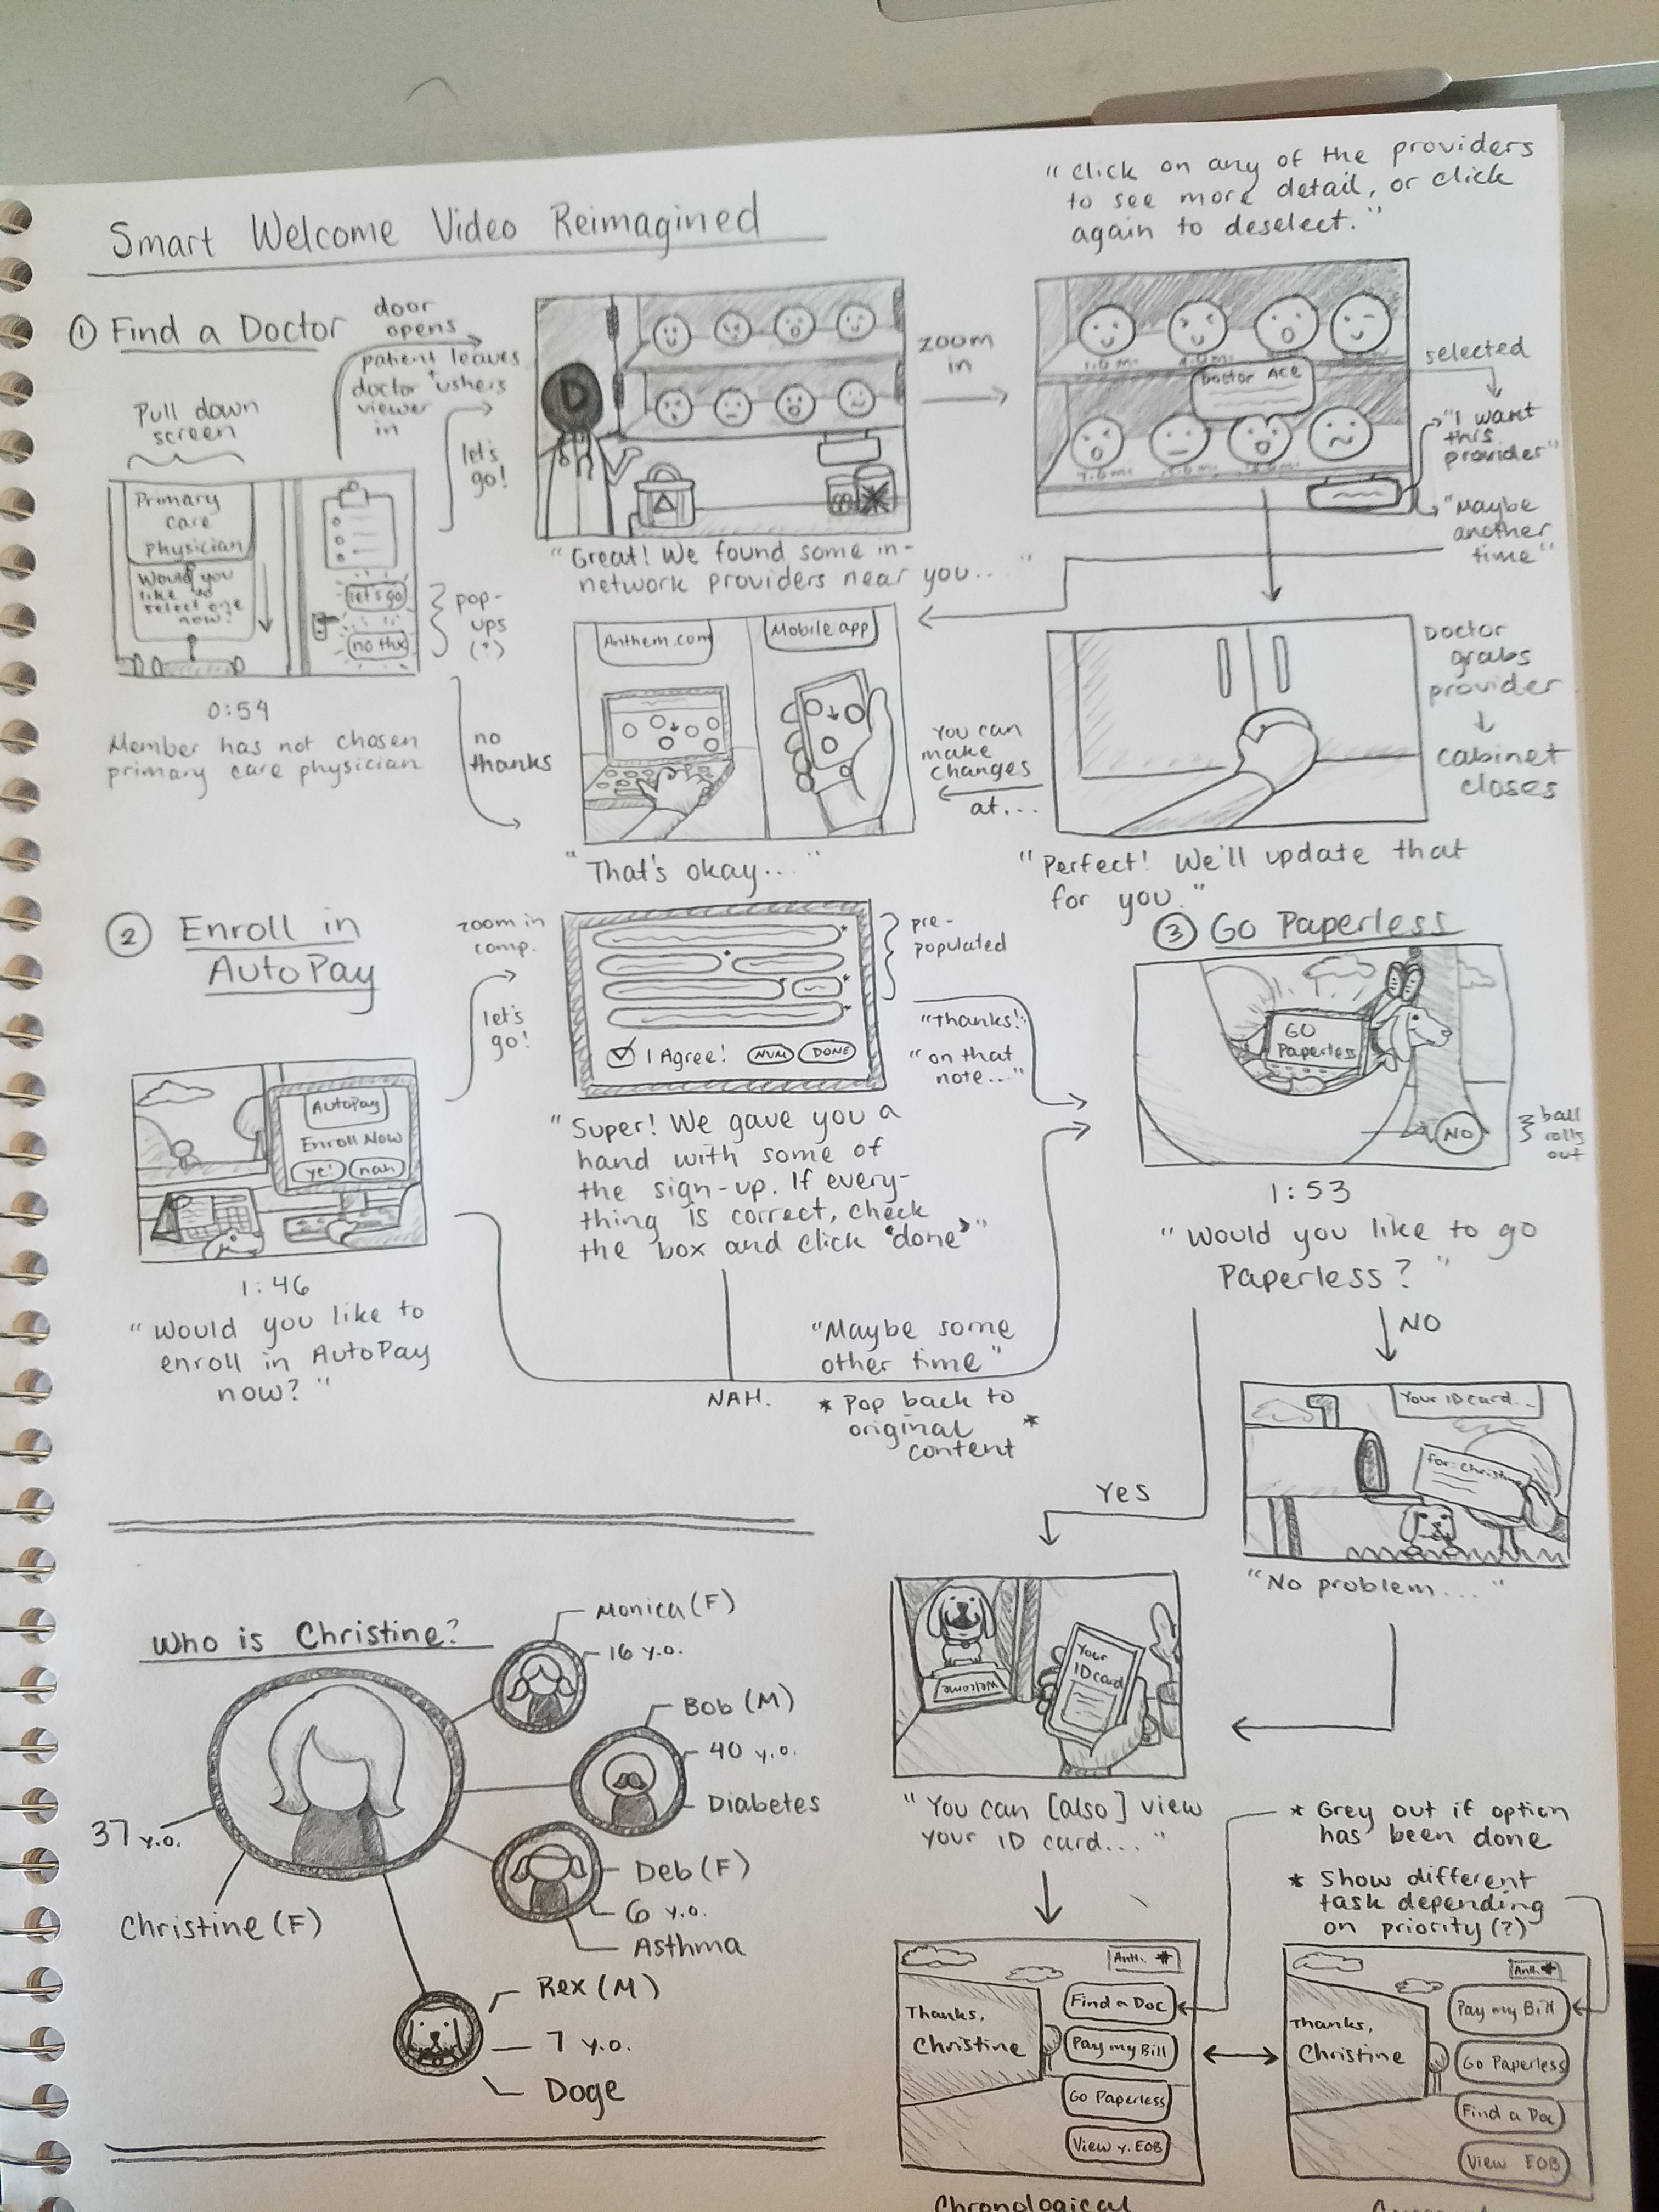 Video Storyboard 1